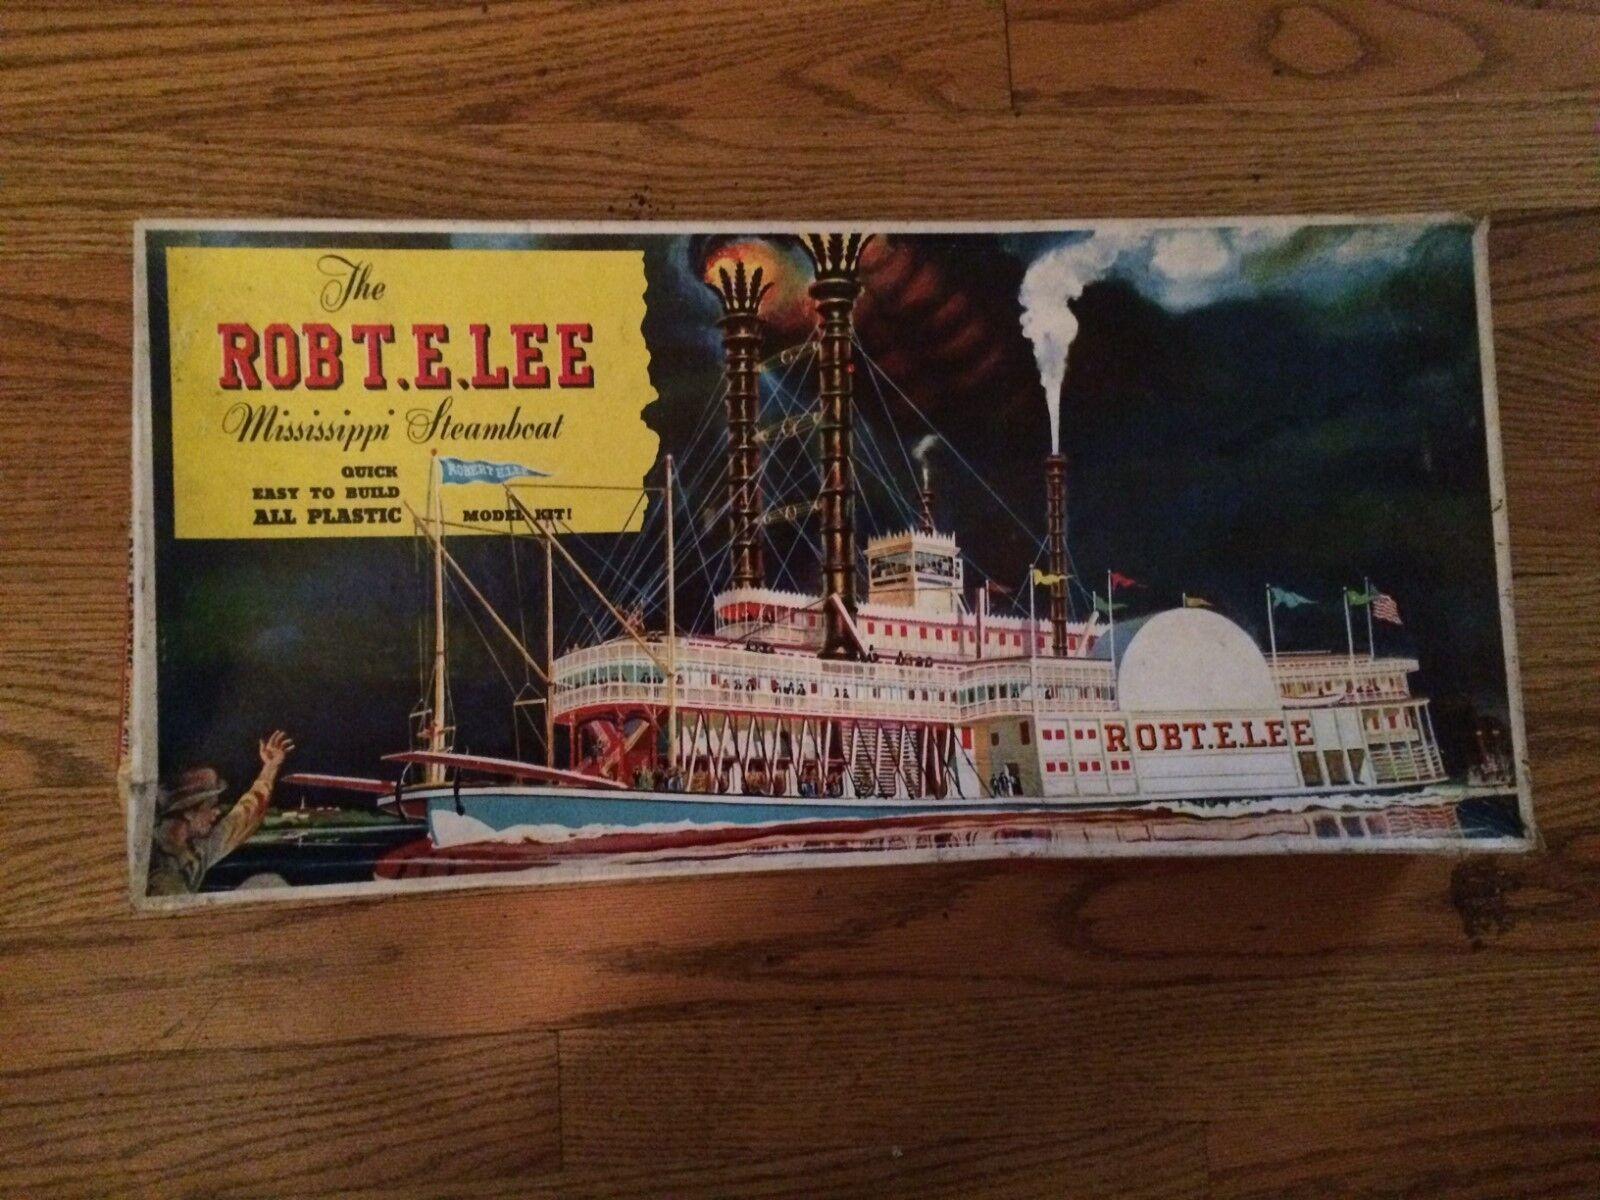 PYRO Plastics The Mississippi Steambåt Robert E Lee Plastic Model Kit Box